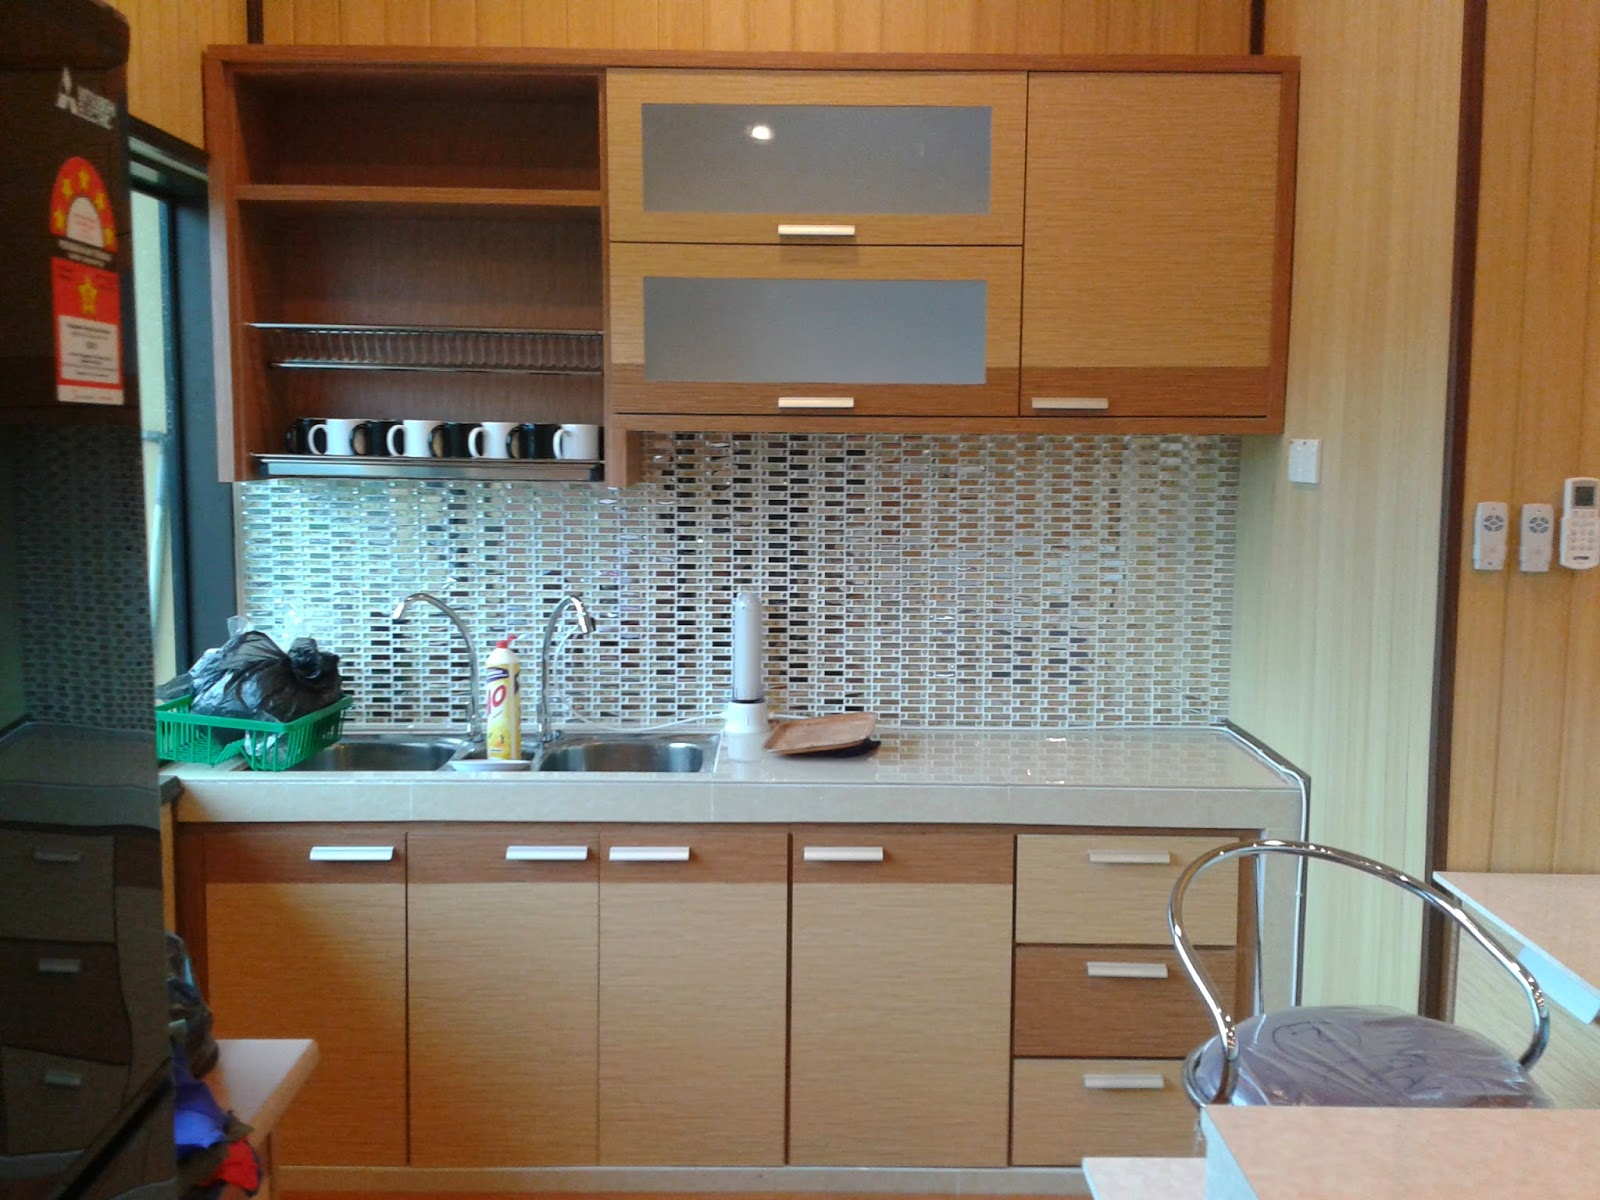 Kabinet Dapur Yang Berkonsep Moden Dilengkapi Dengan Rak Pinggan Dan Menggunakan Formica Berwarna Kayu